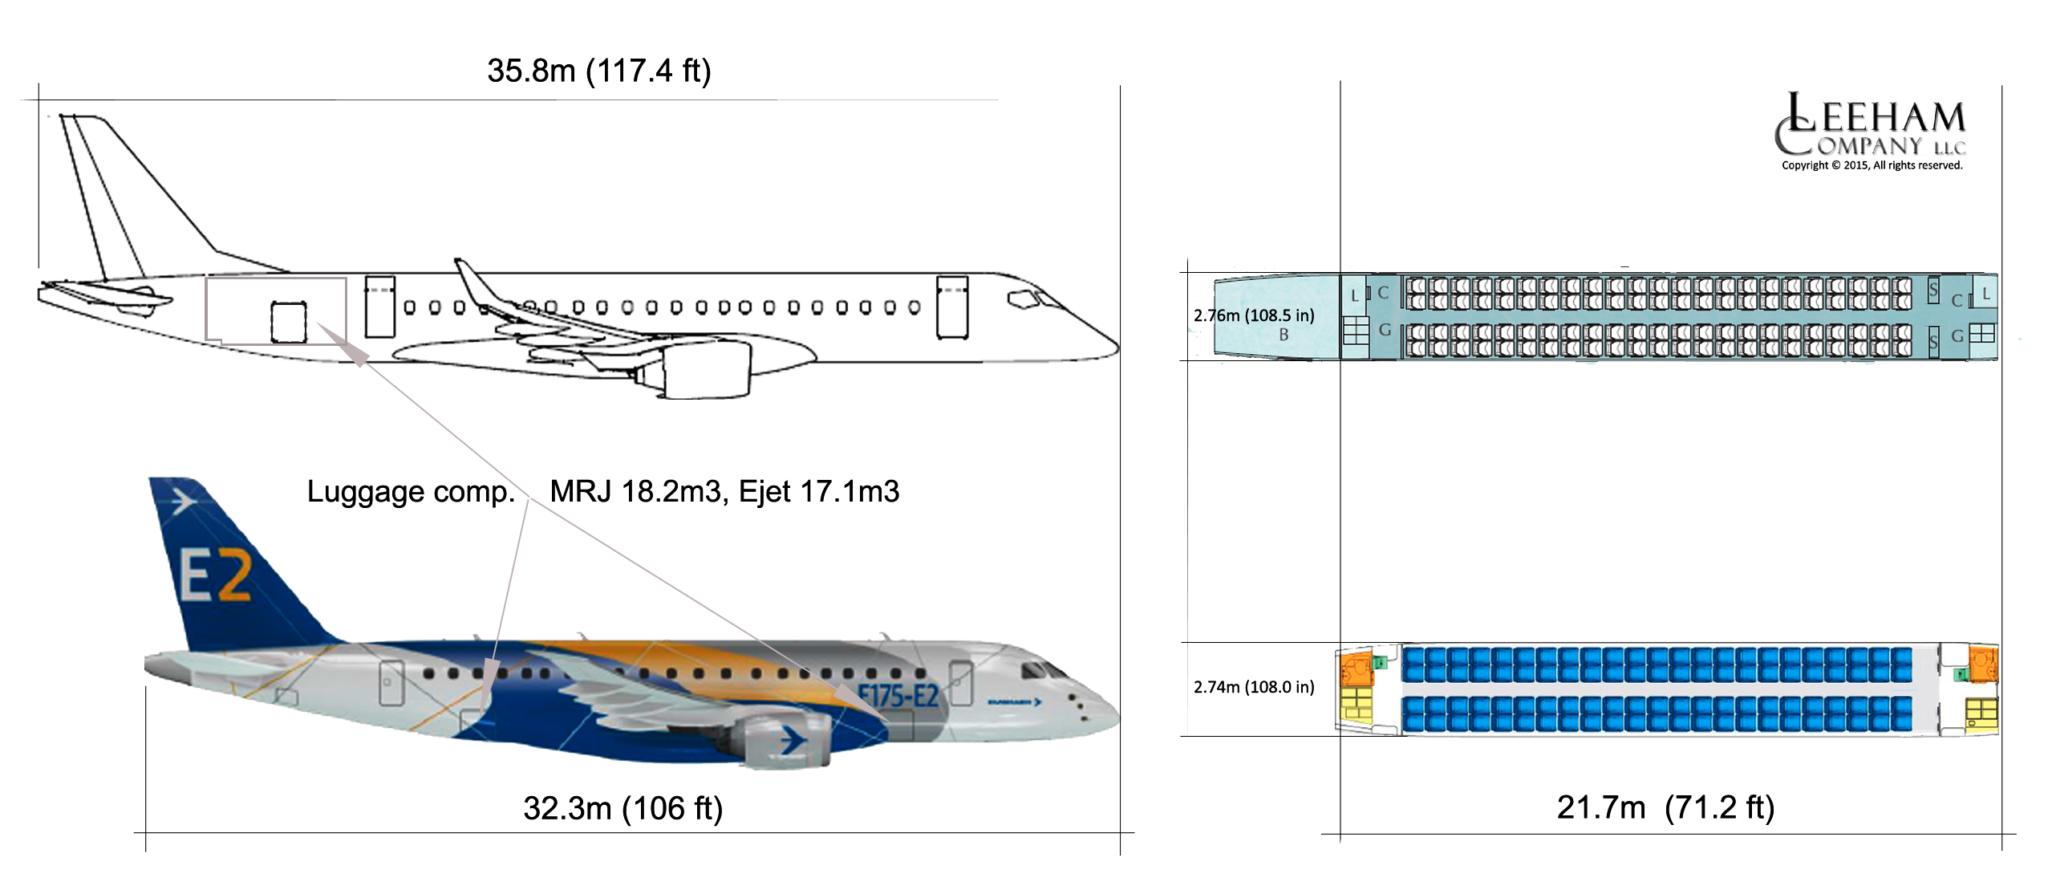 MRJ vs E2 175 side and cabins upd